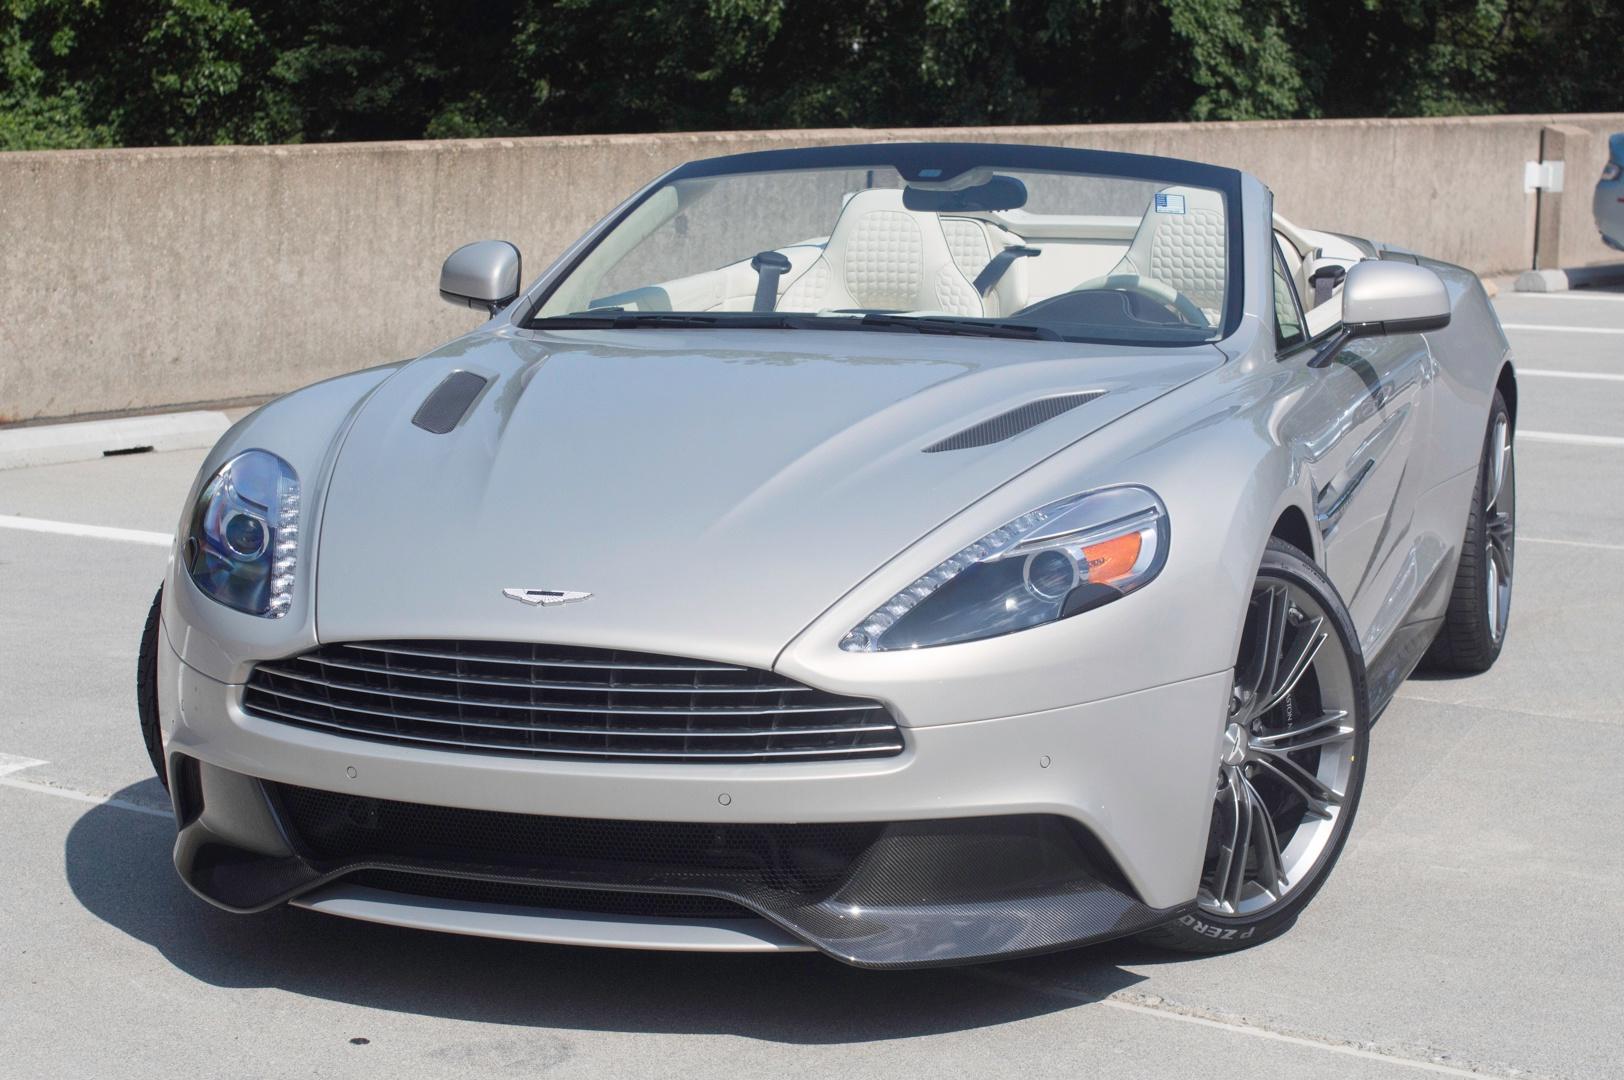 2014 Aston Martin Vanquish Volante Stock # 4NK01674 for sale near ...